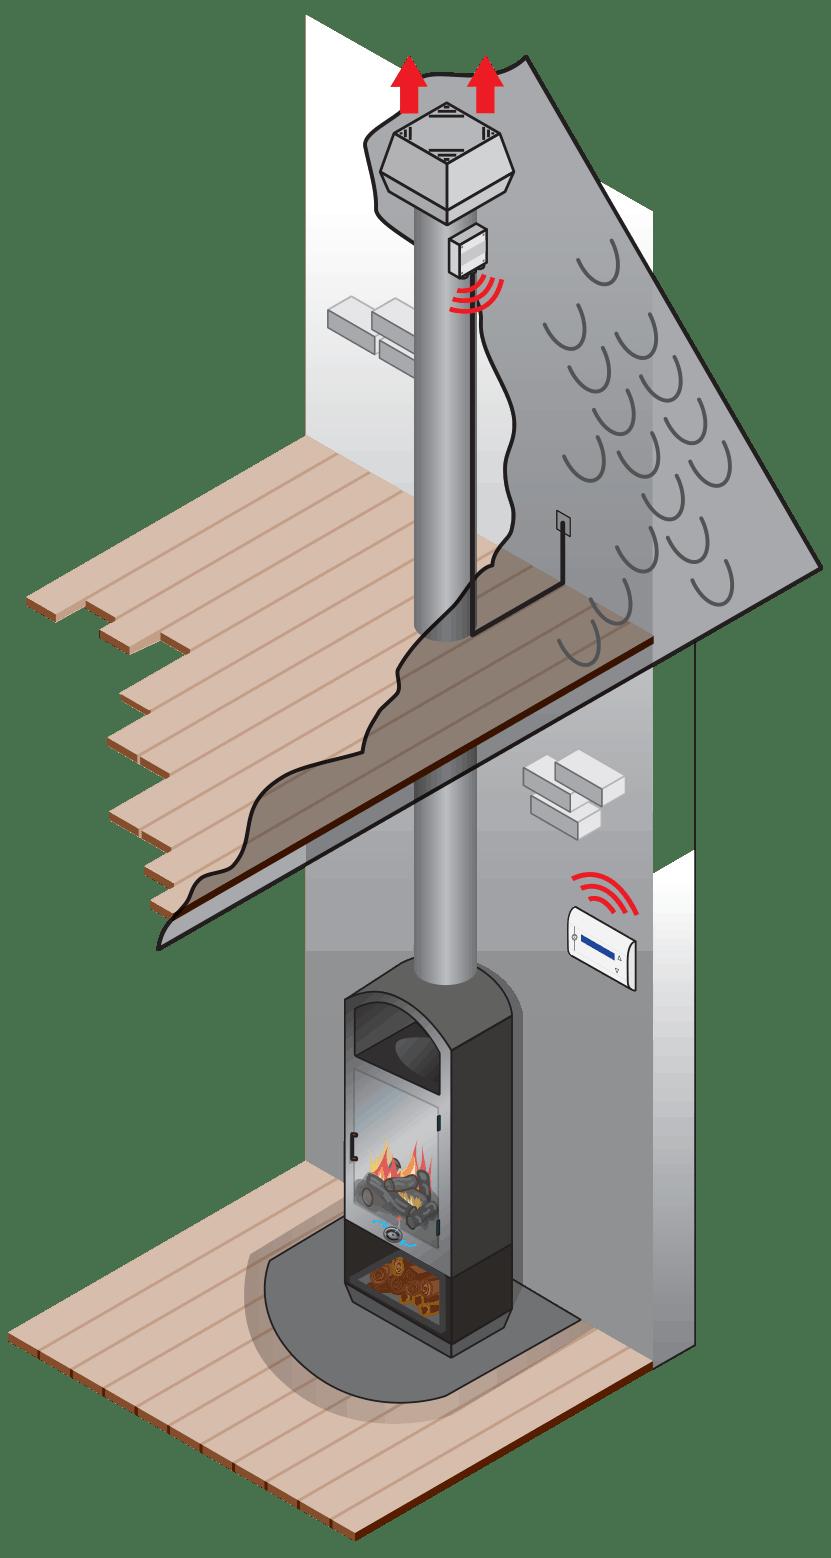 chimney fan illustration_EW41